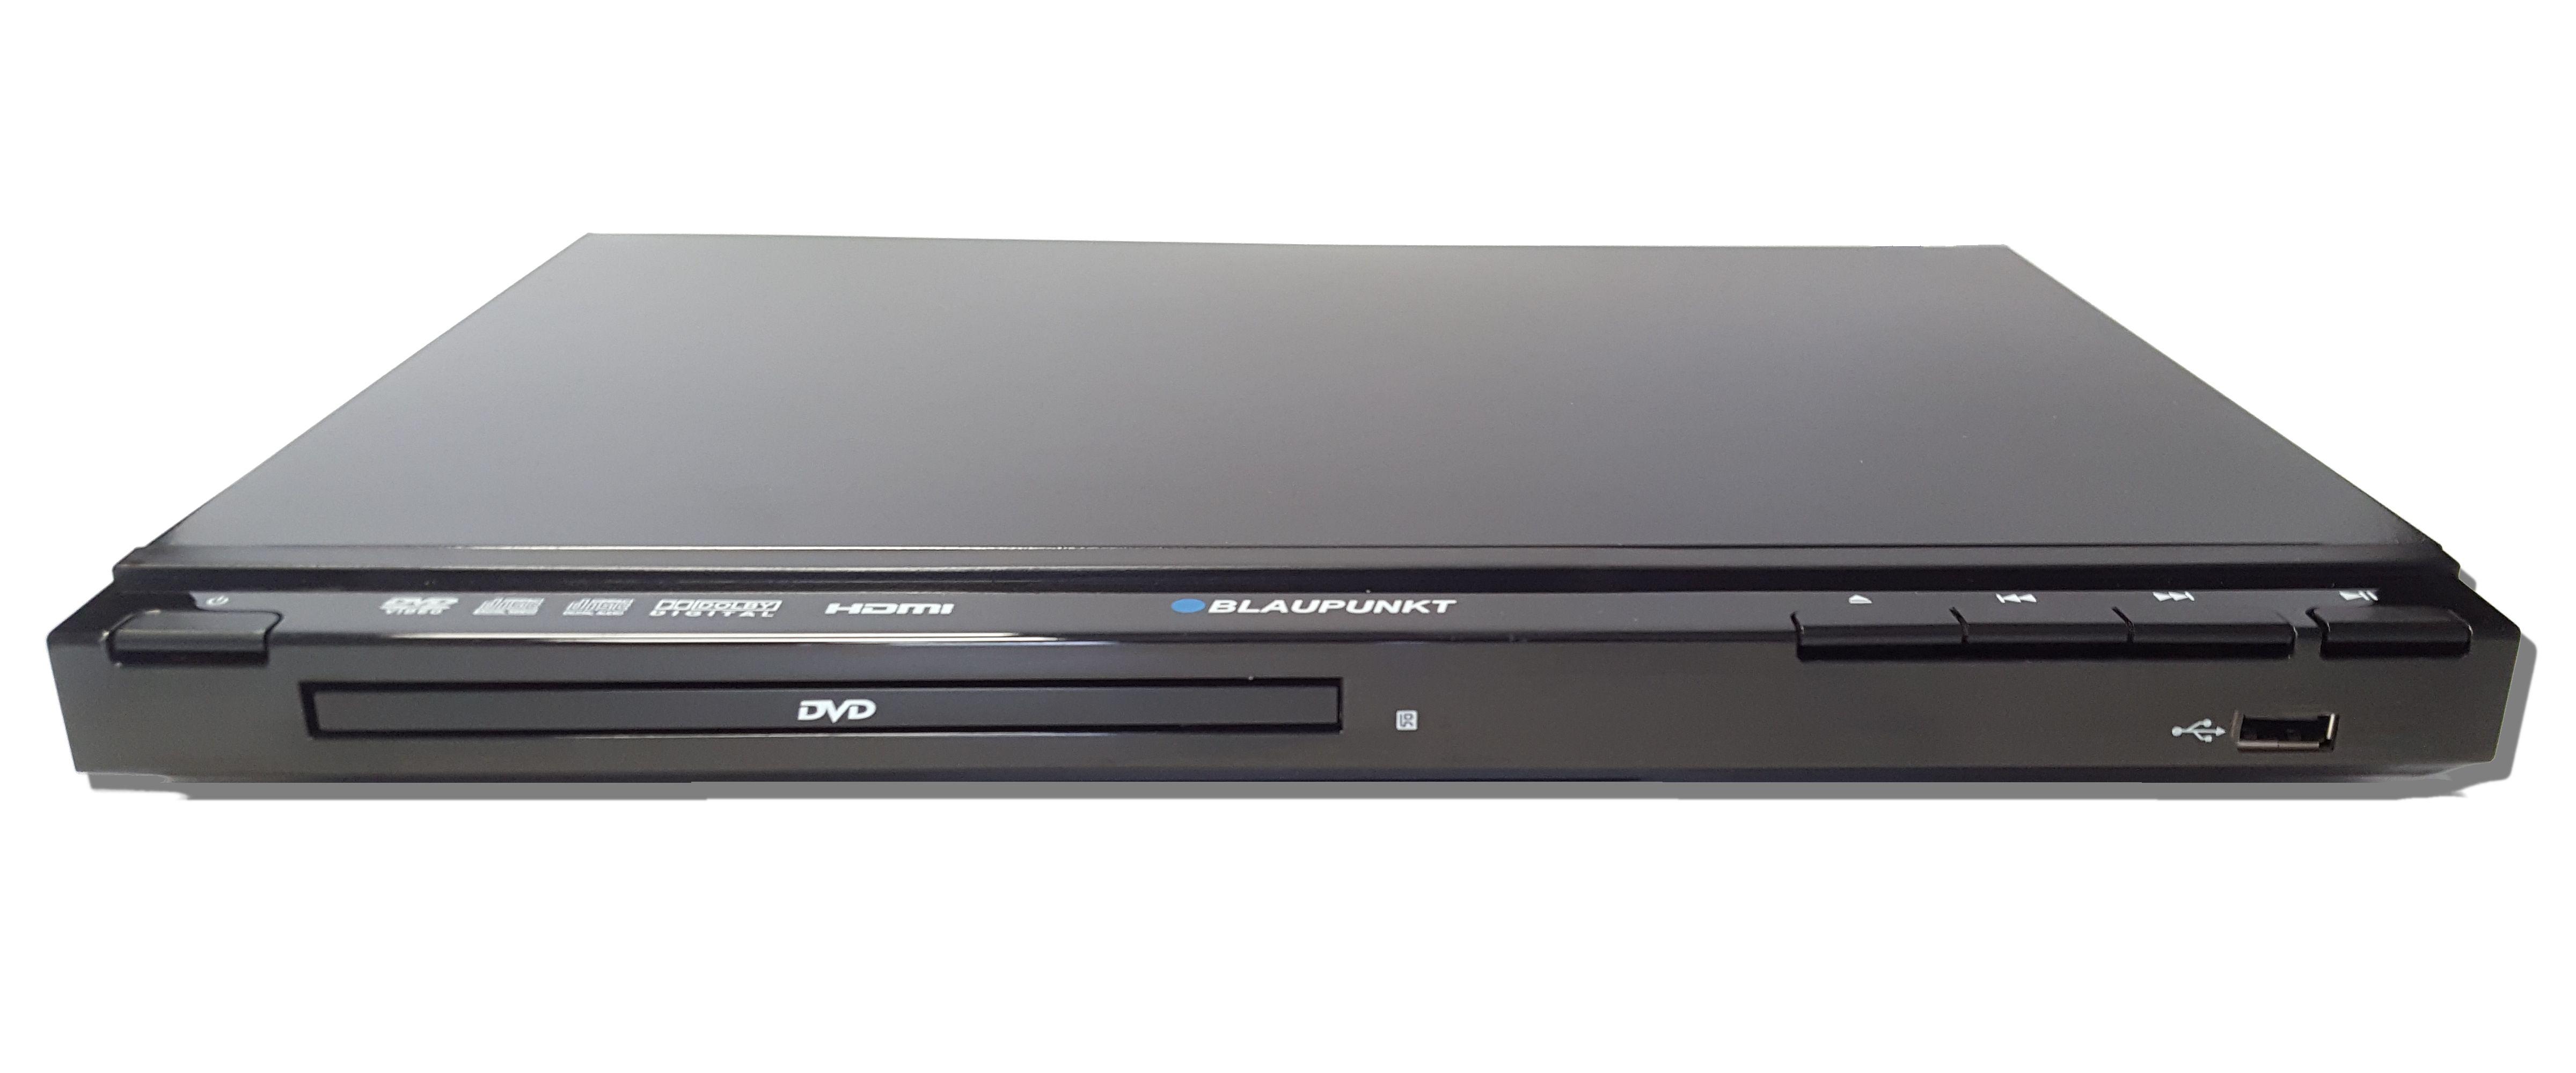 blaupunkt dv2308 dvd player built in 1080p upscaling ebay. Black Bedroom Furniture Sets. Home Design Ideas